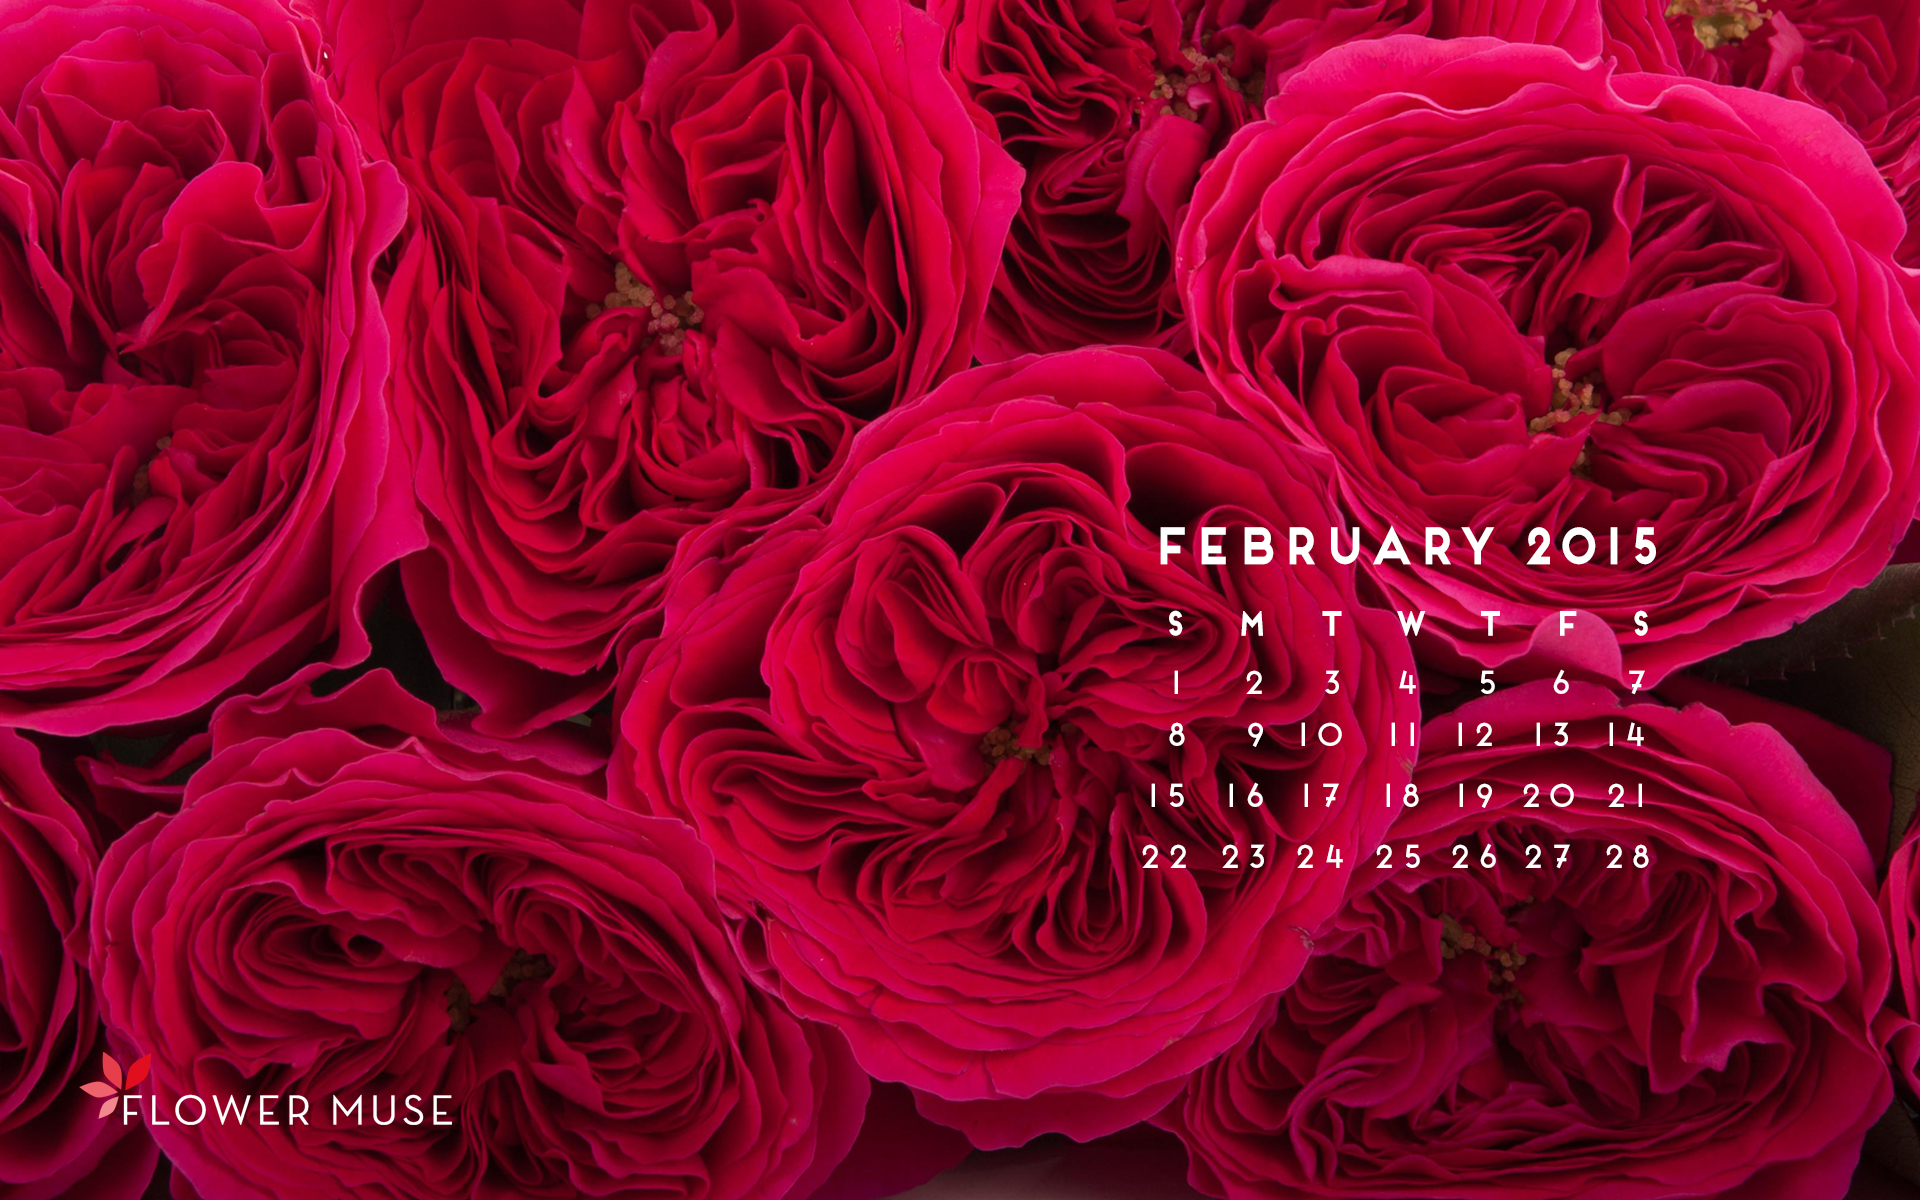 February 2015 Calendar Flower Muse Blog 1920x1200